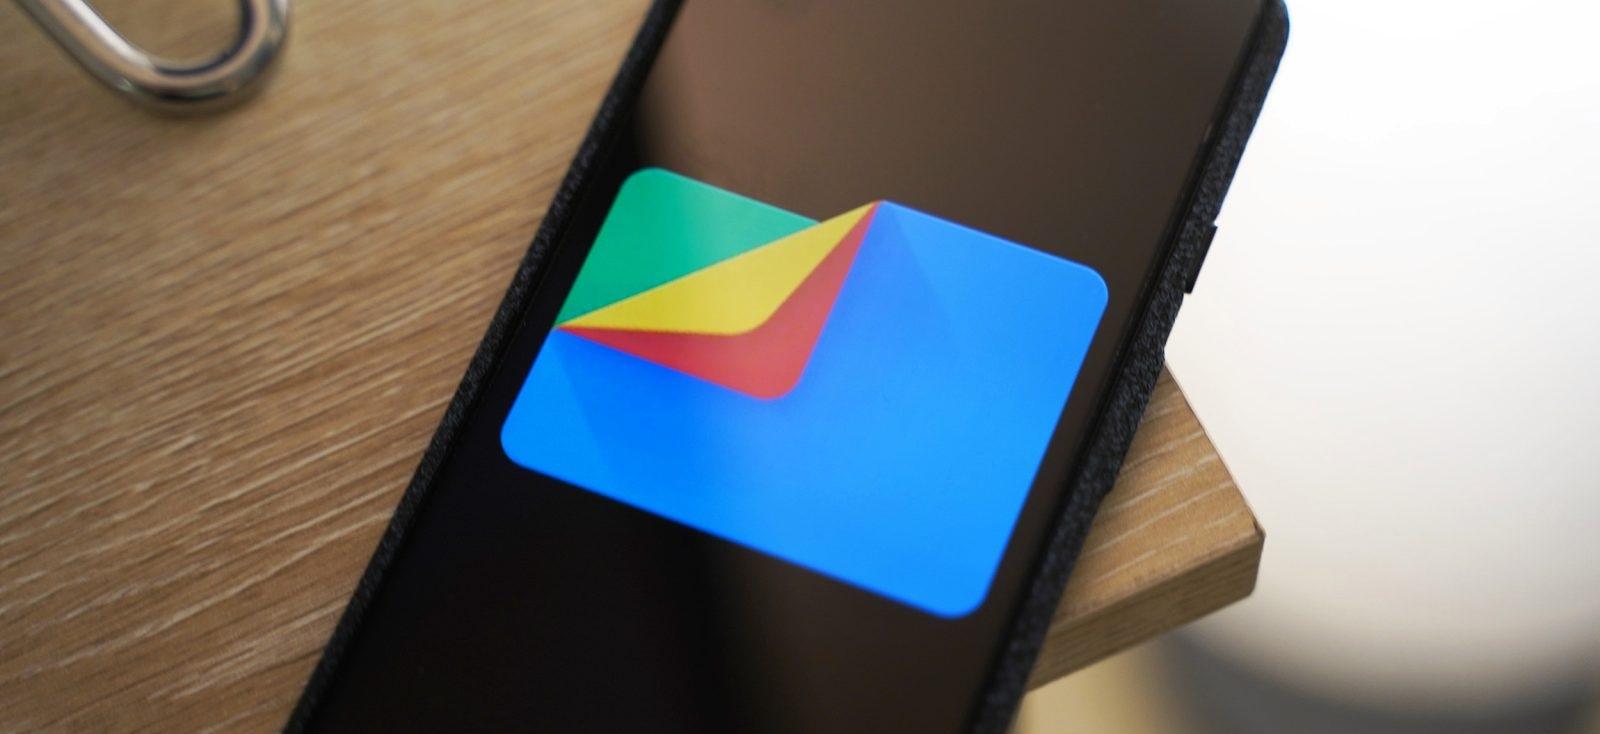 Google's Files app now streams local media to your Chromecast